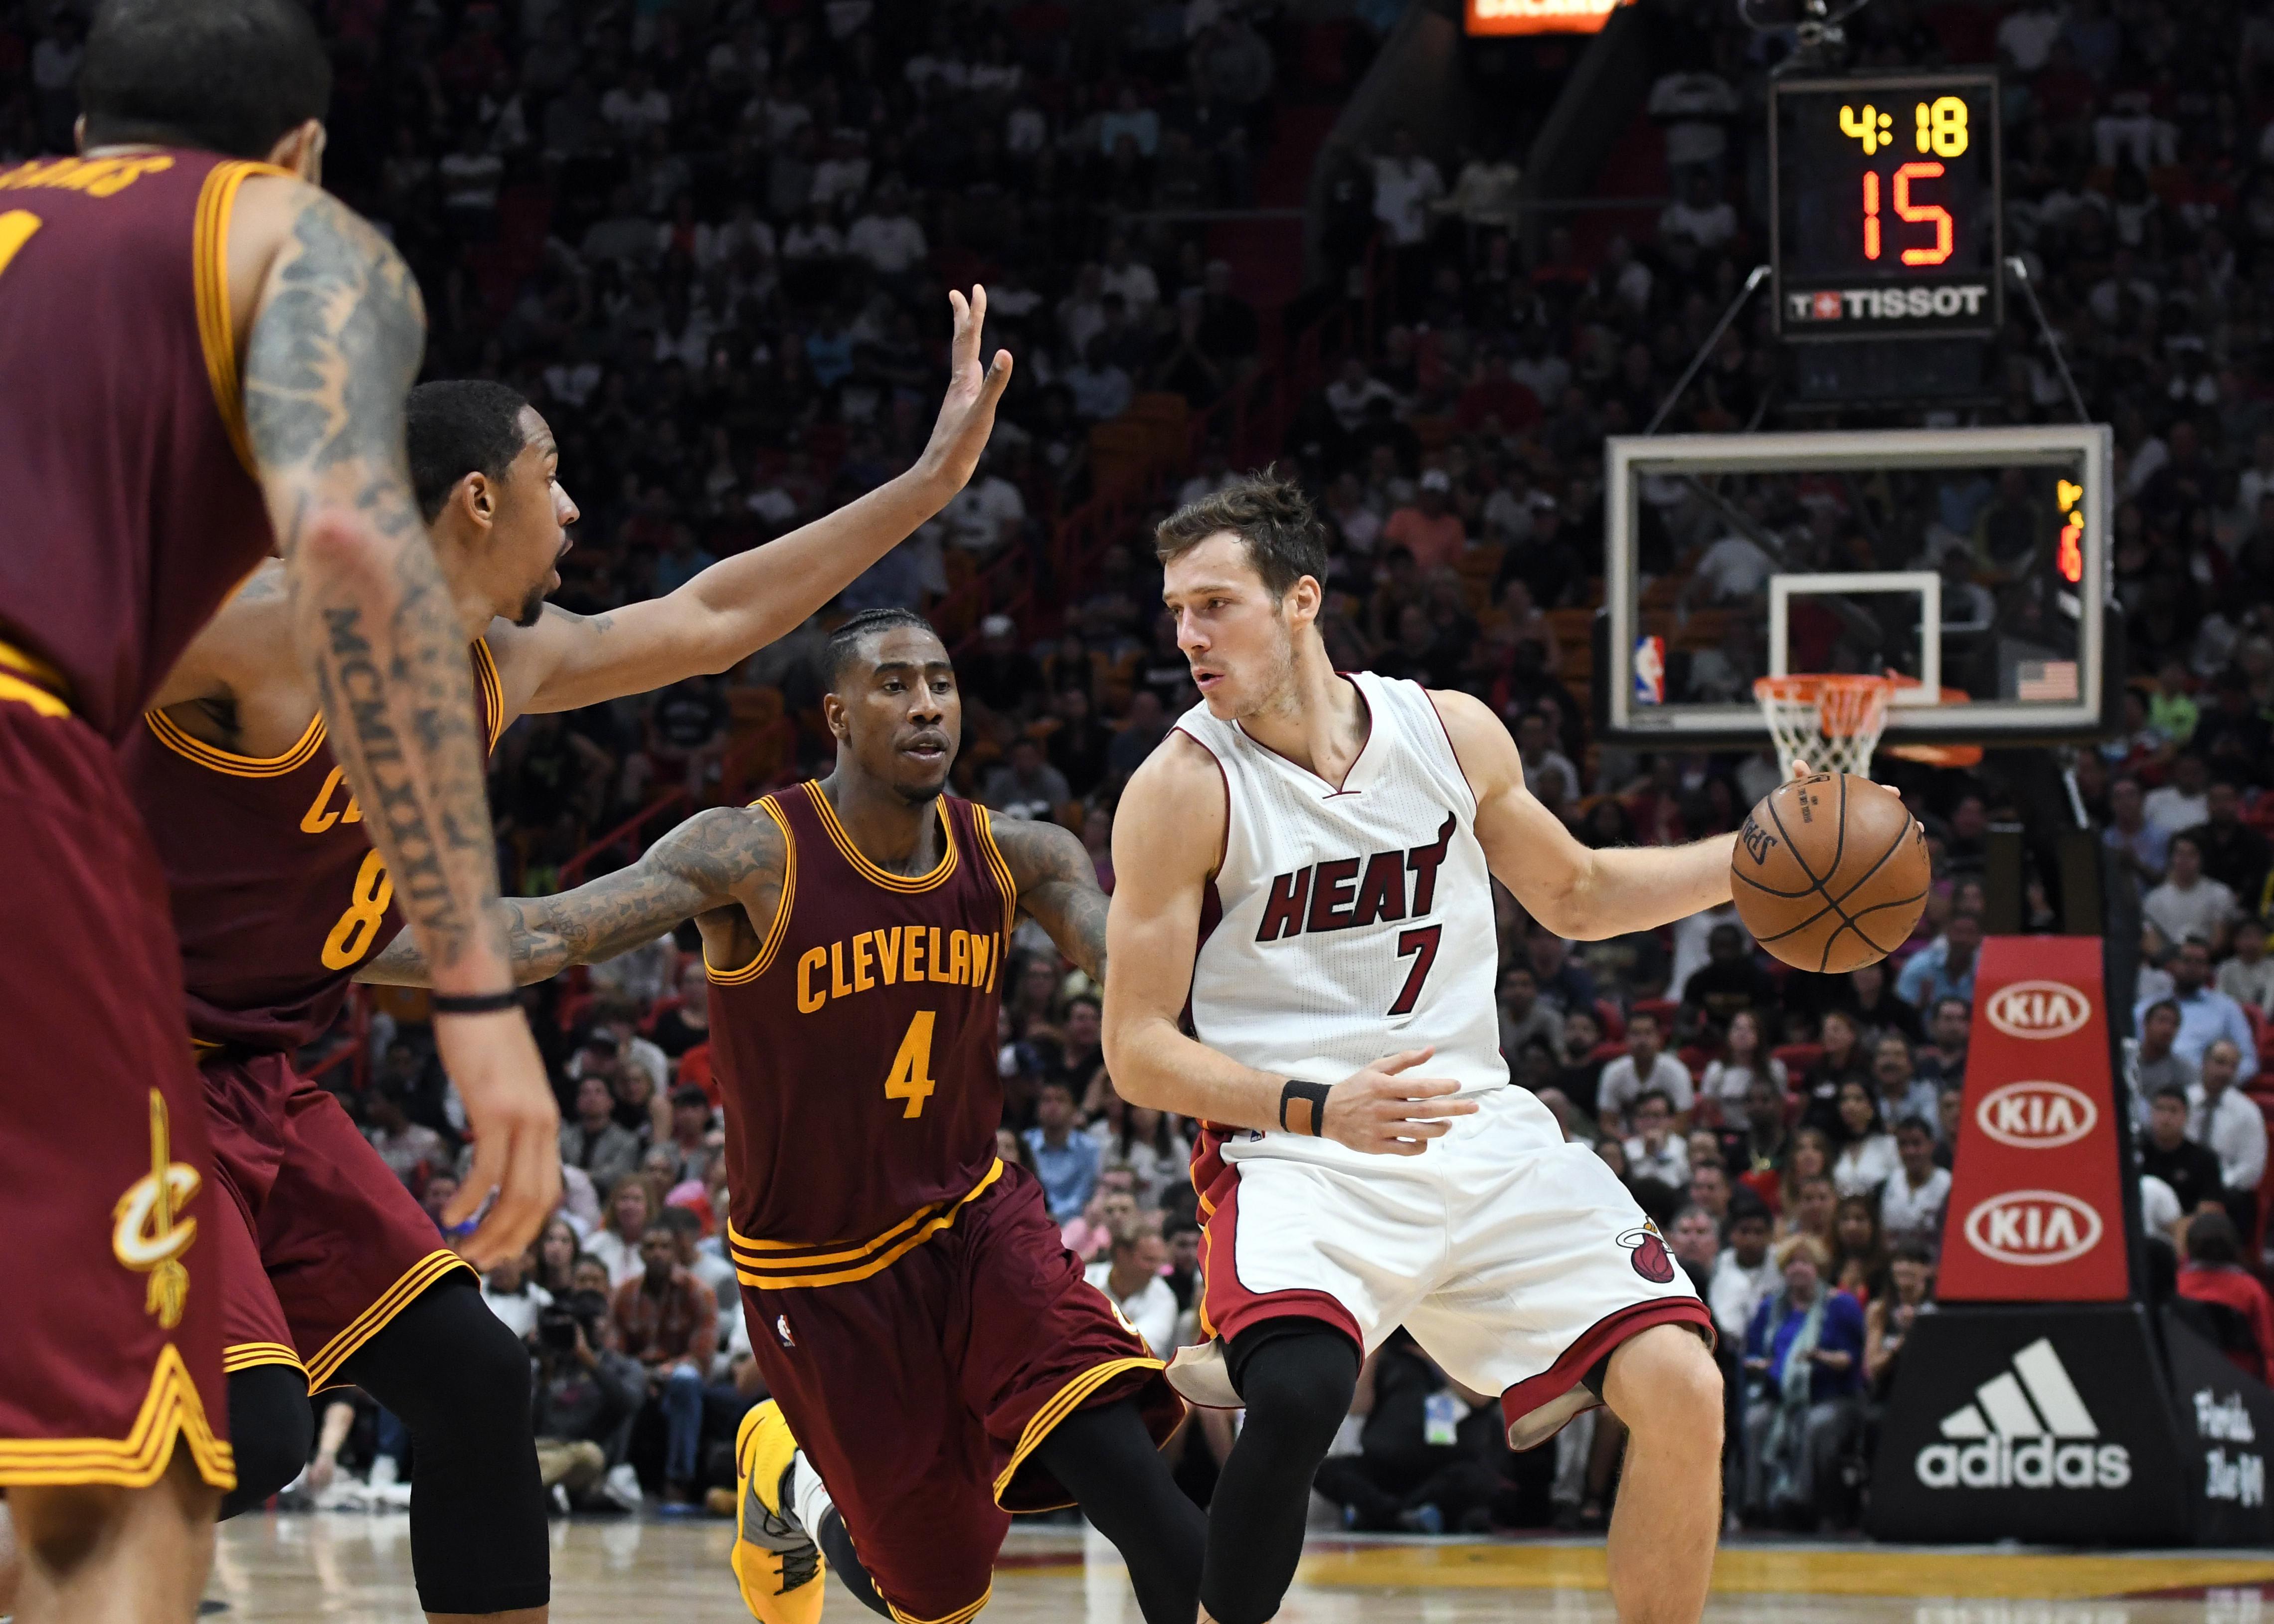 Miami heat roster nba - Miami Heat Winning Roster Miami Heat Save Their Season With Win Vs Cavaliers Miami Heat